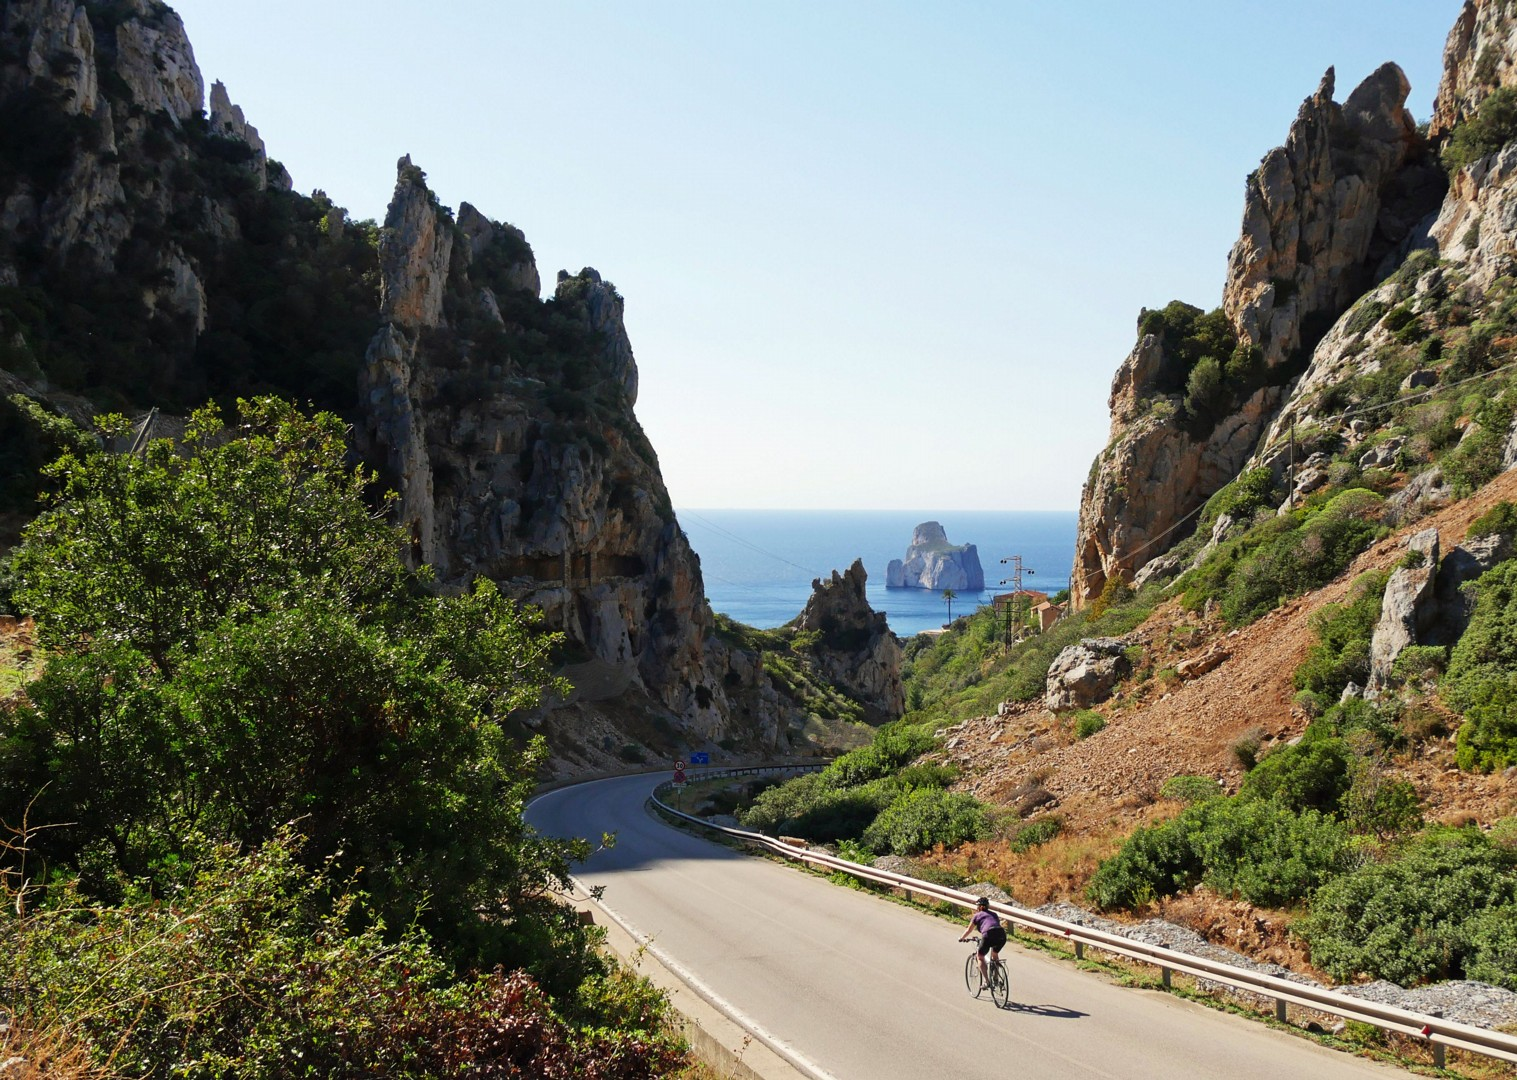 pan-di-zucchero-sea-cliffs-sardinia.jpg - Italy - Sardinia - Island Flavours - Self-Guided Leisure Cycling Holiday - Italia Leisure and Family Cycling